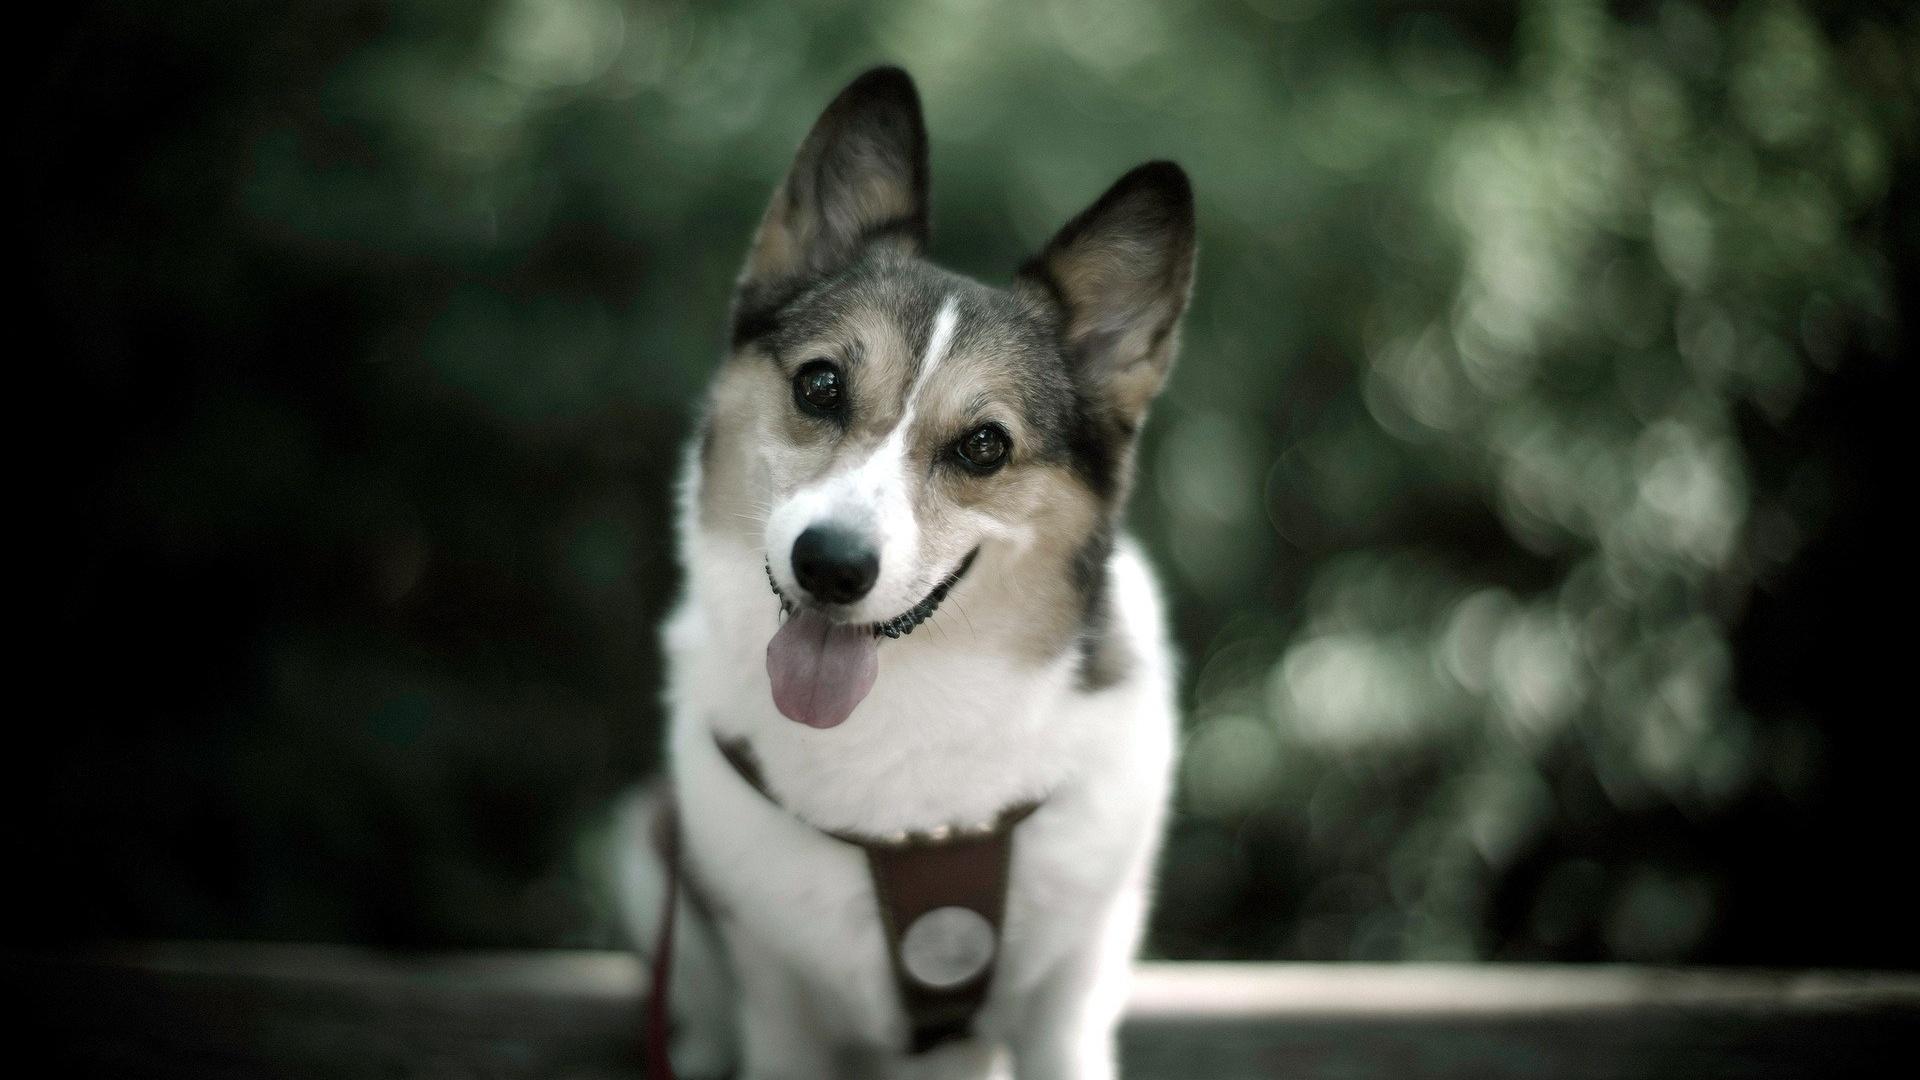 1920x1080 Cute Dog Photo desktop PC and Mac wallpaper 1920x1080